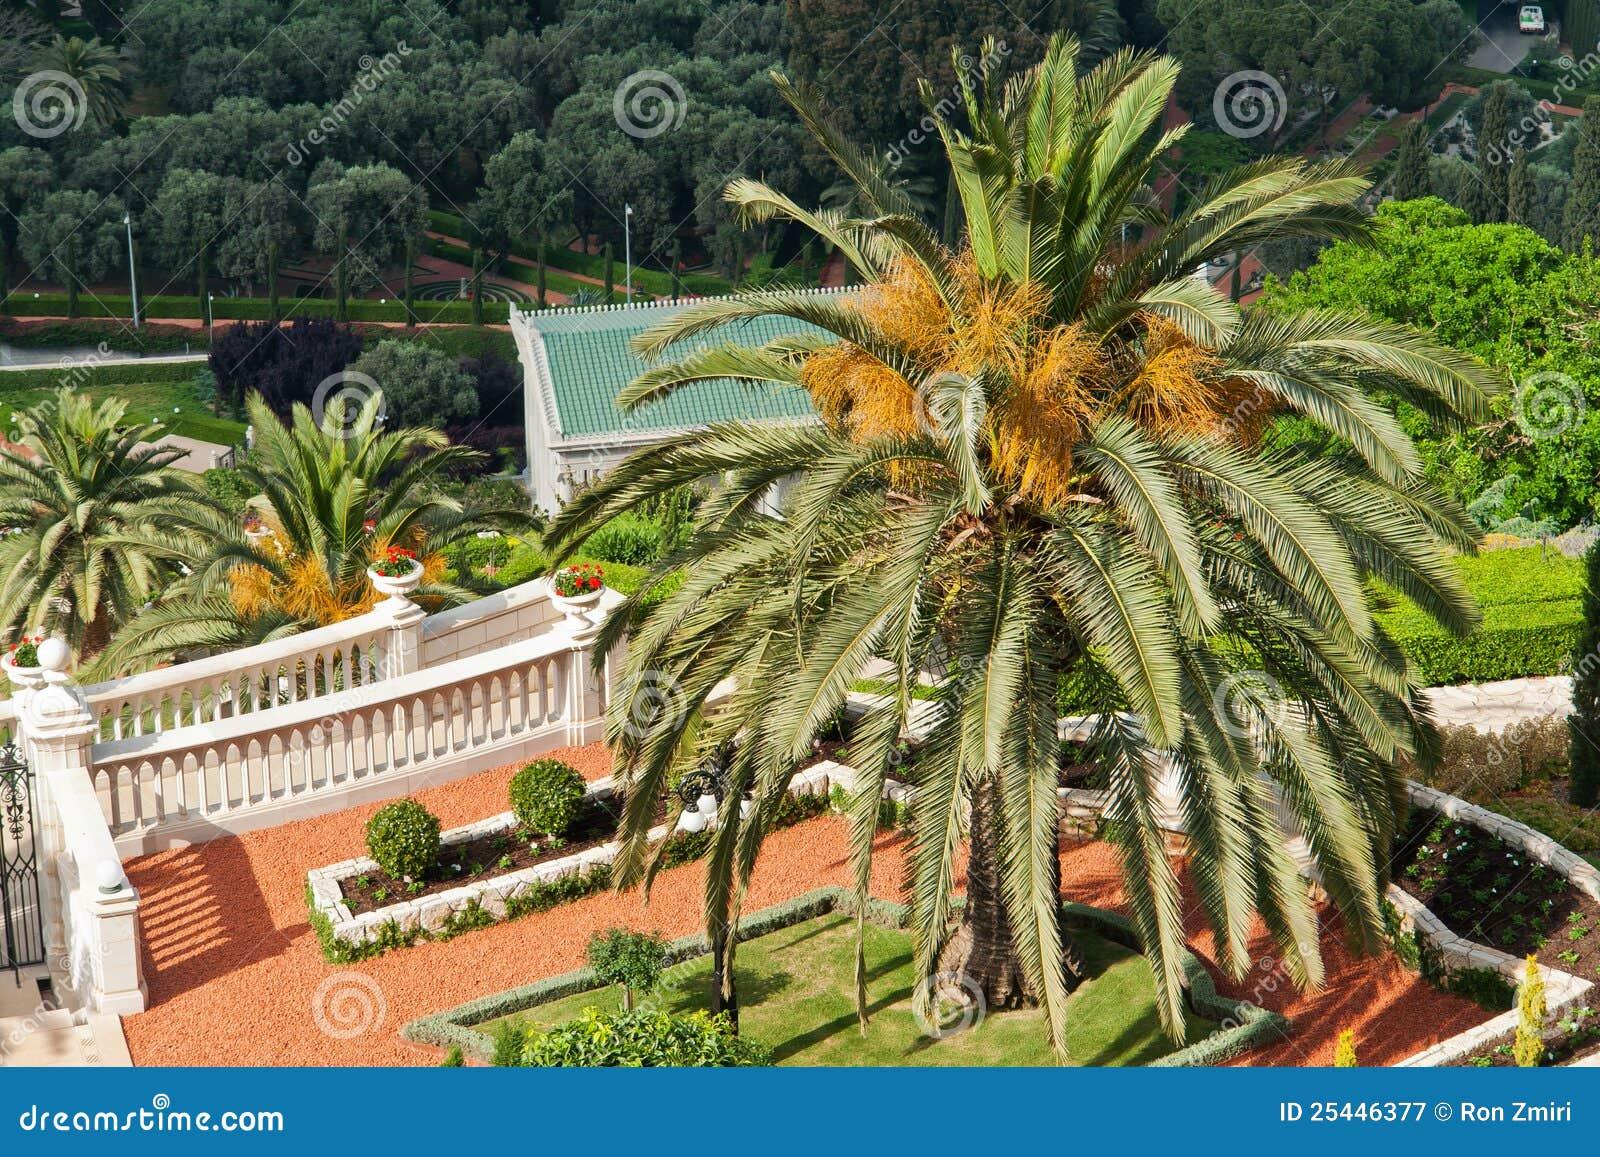 particolari dei giardini di bahai a haifa israele immagine